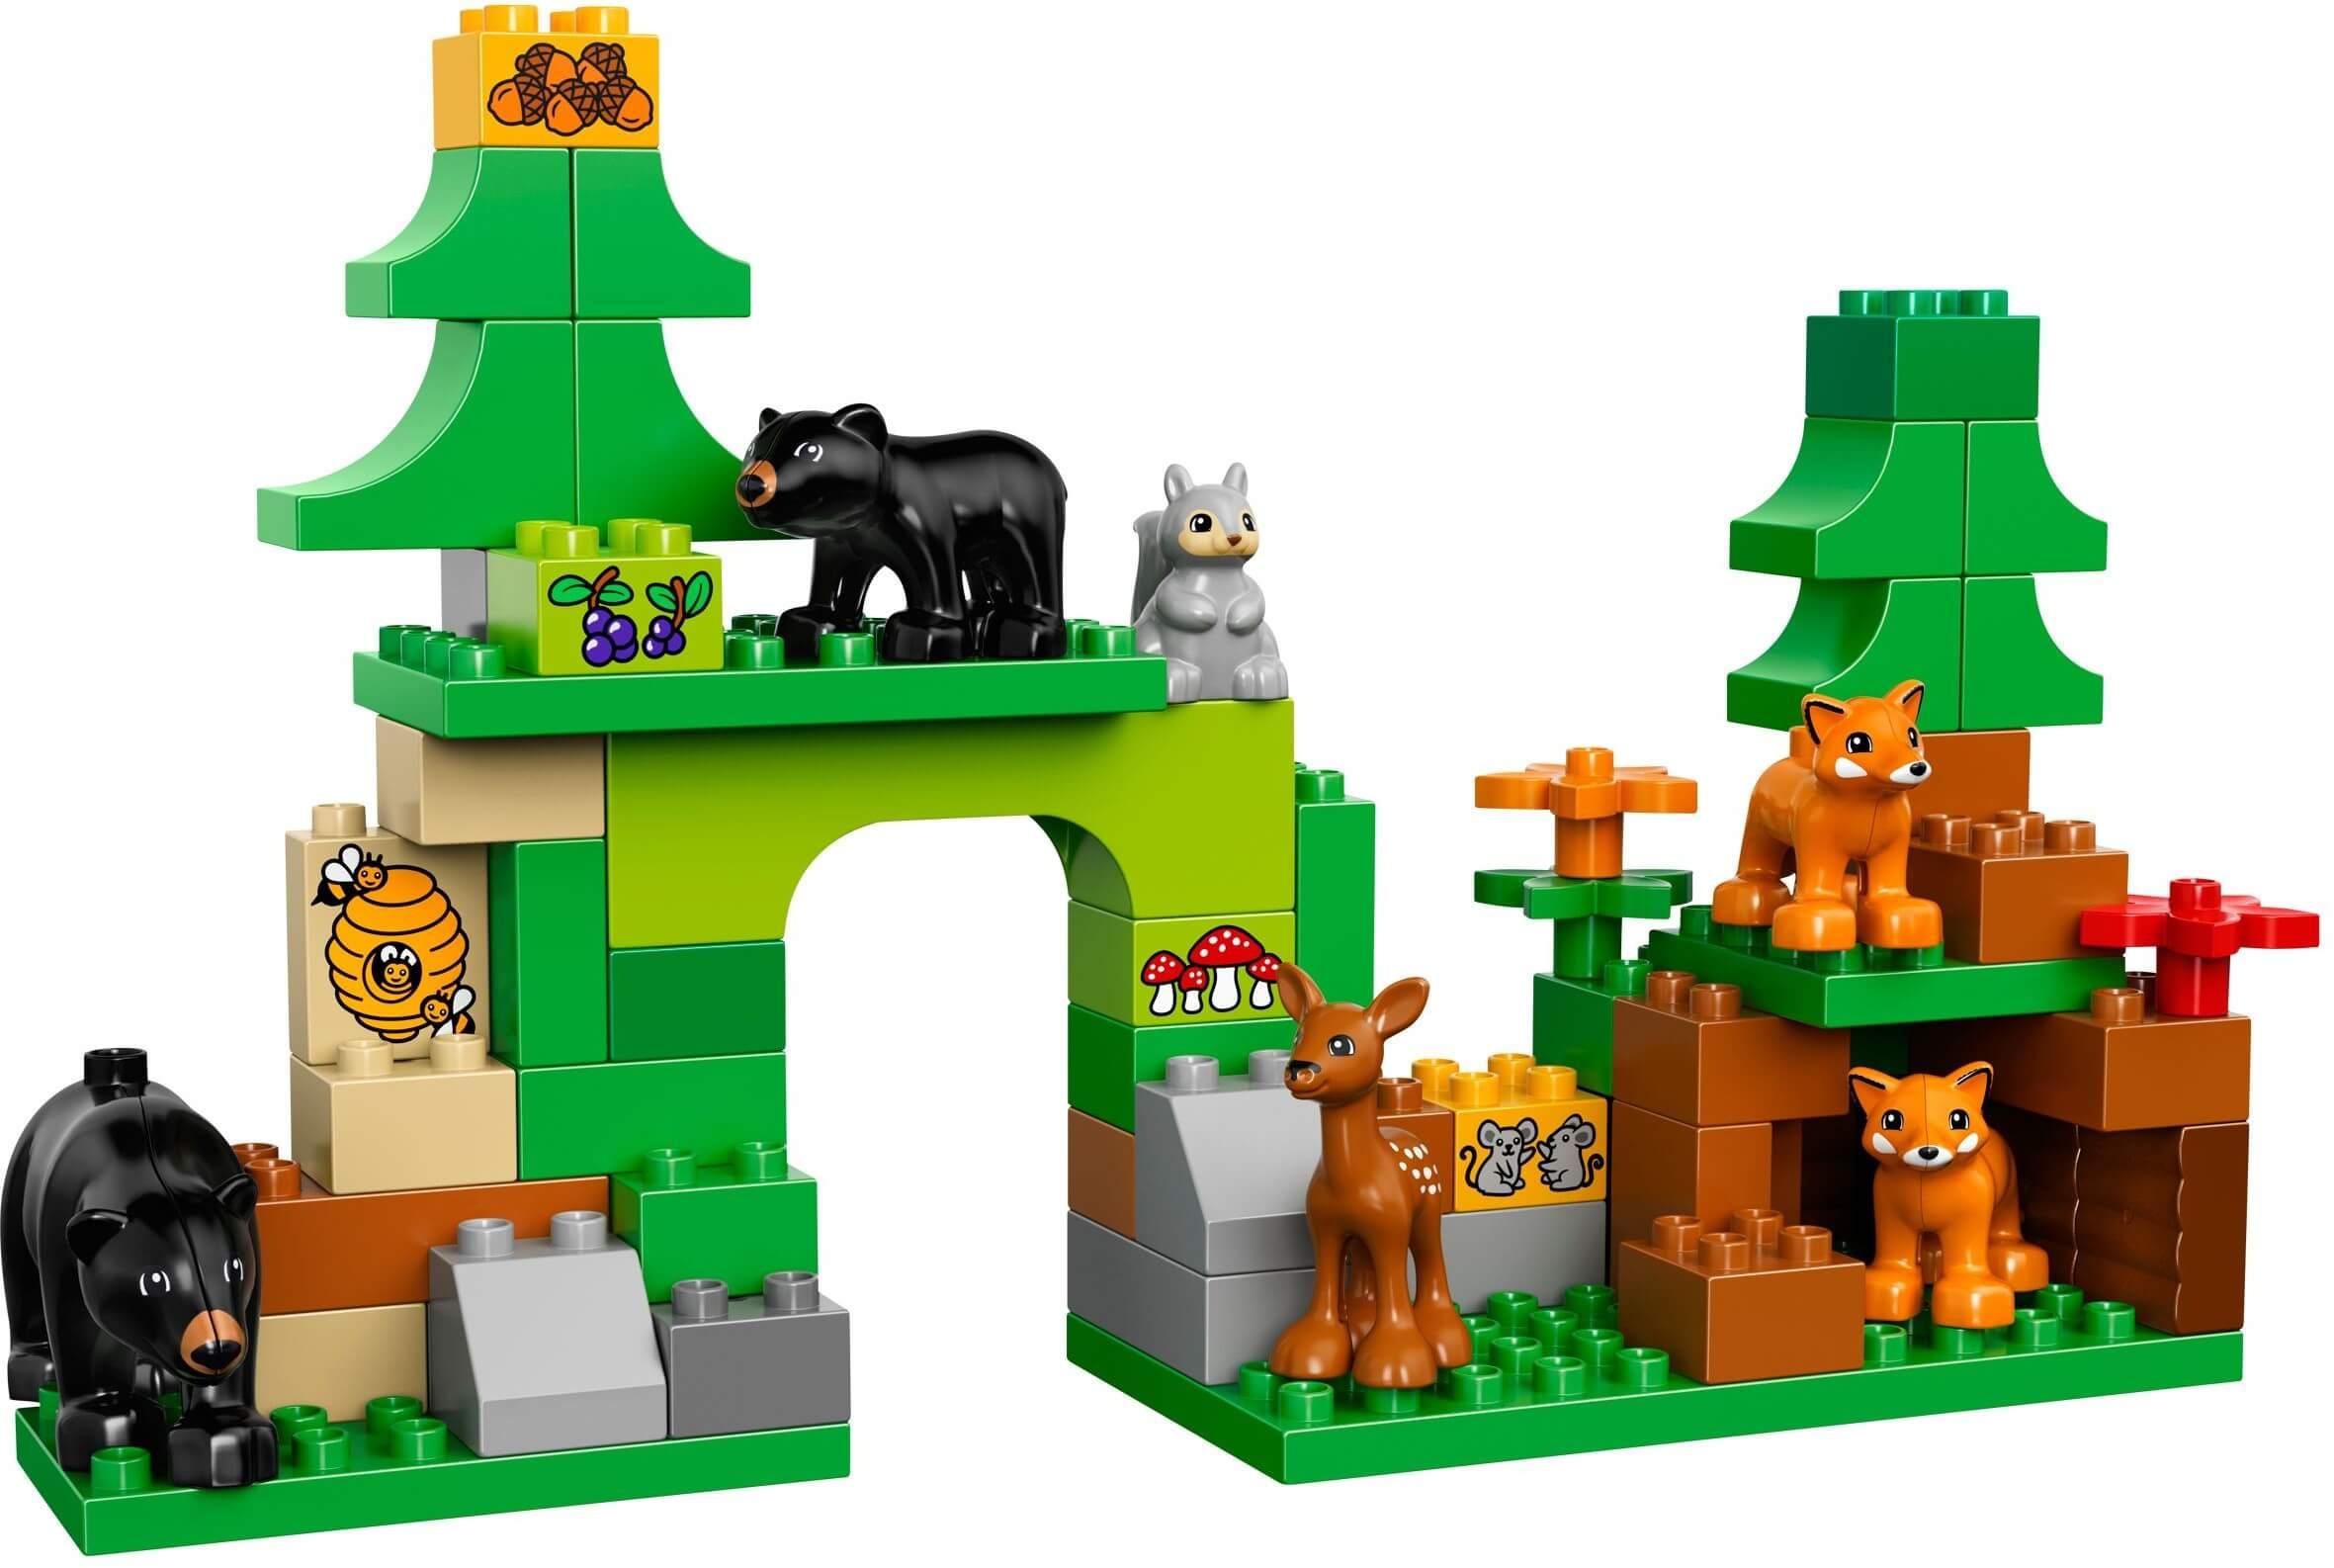 Mua đồ chơi LEGO 10584 - LEGO DUPLO 10584 - Khu rừng sở thú của Bé (LEGO DUPLO Forest: Park 10584)